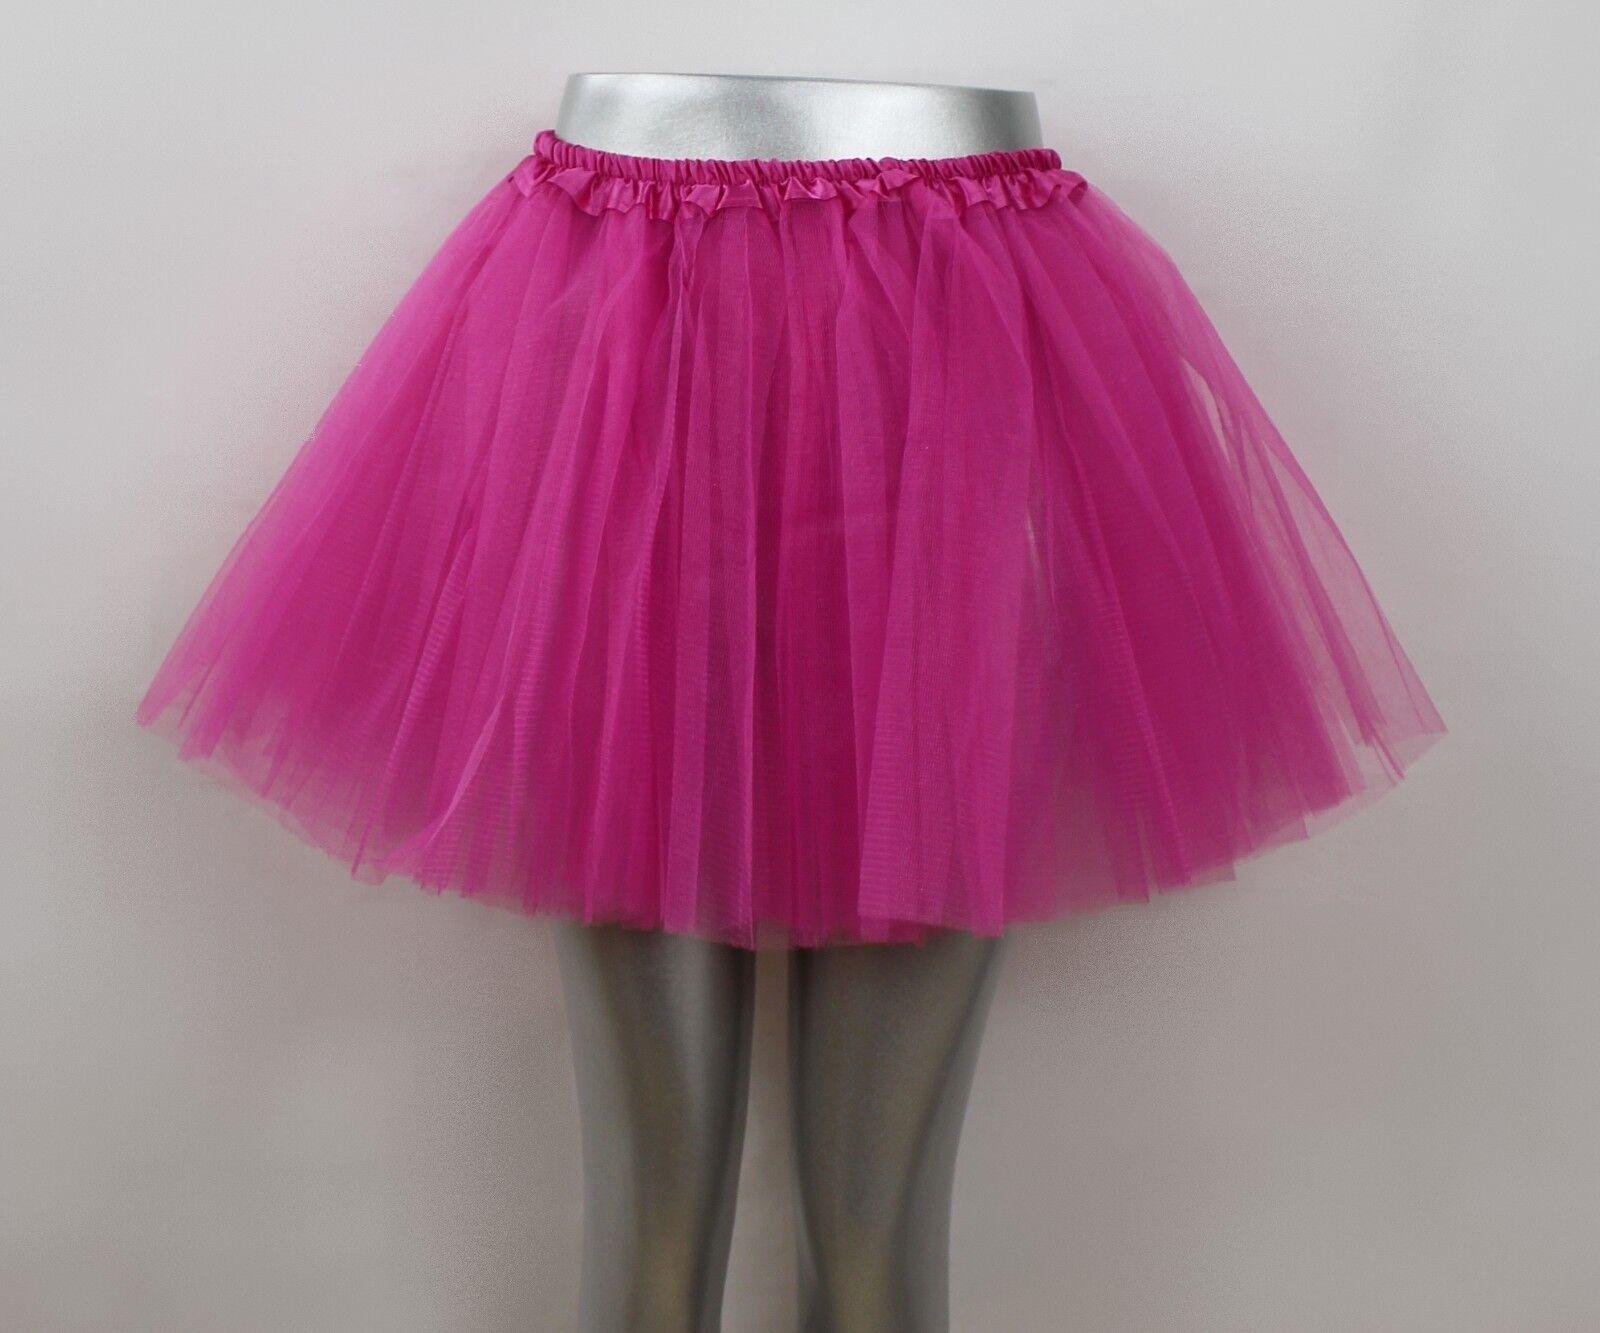 Medium - Pink